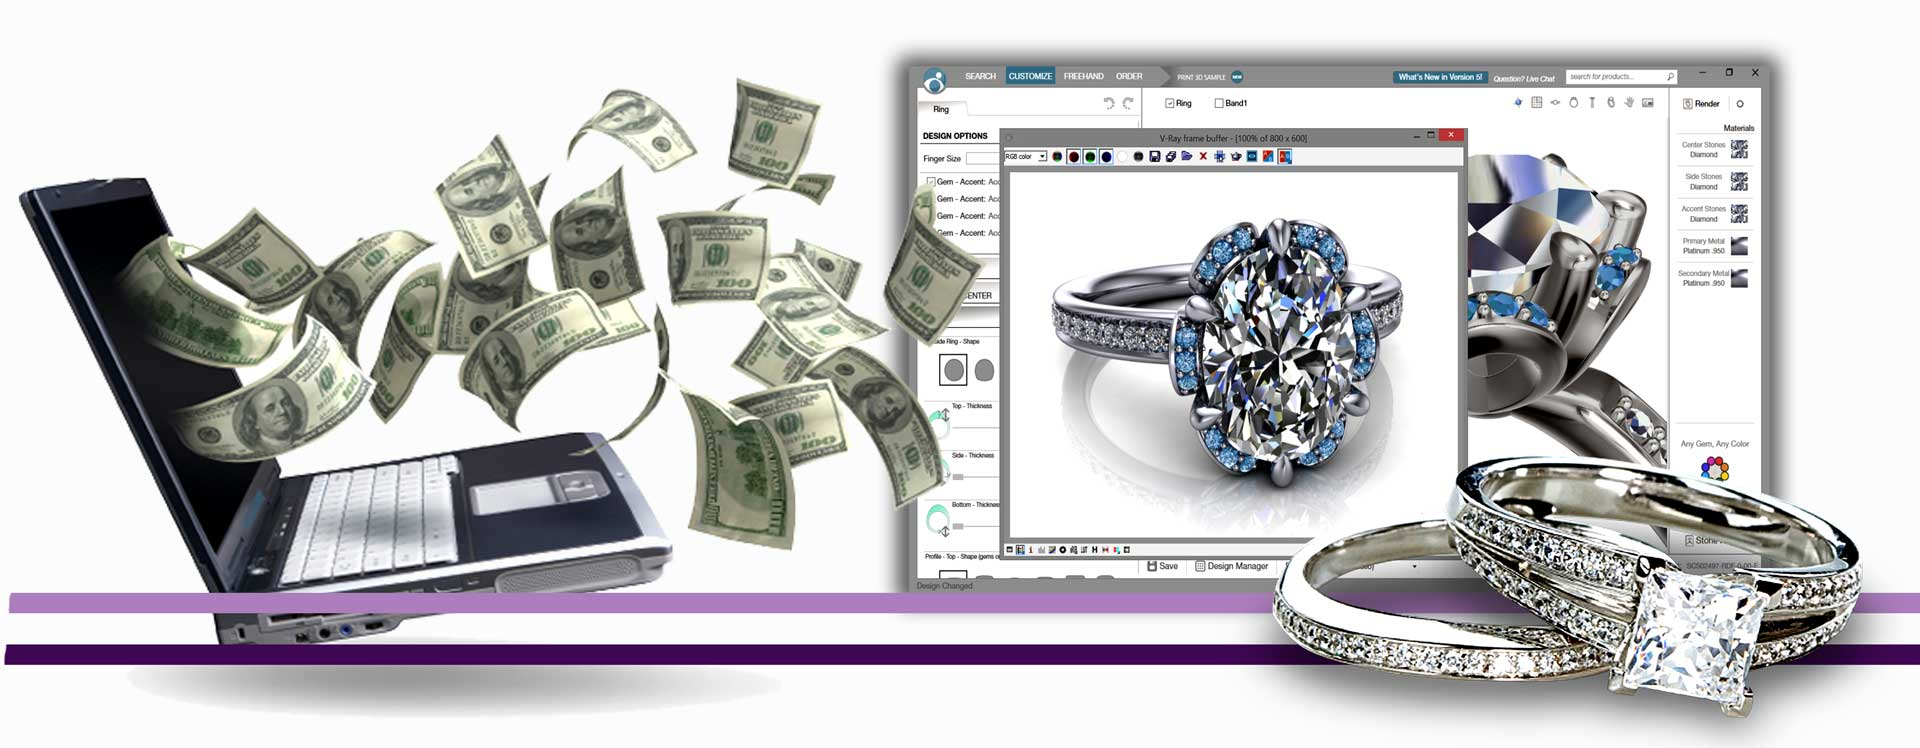 طراحی جواهرات سفارشی